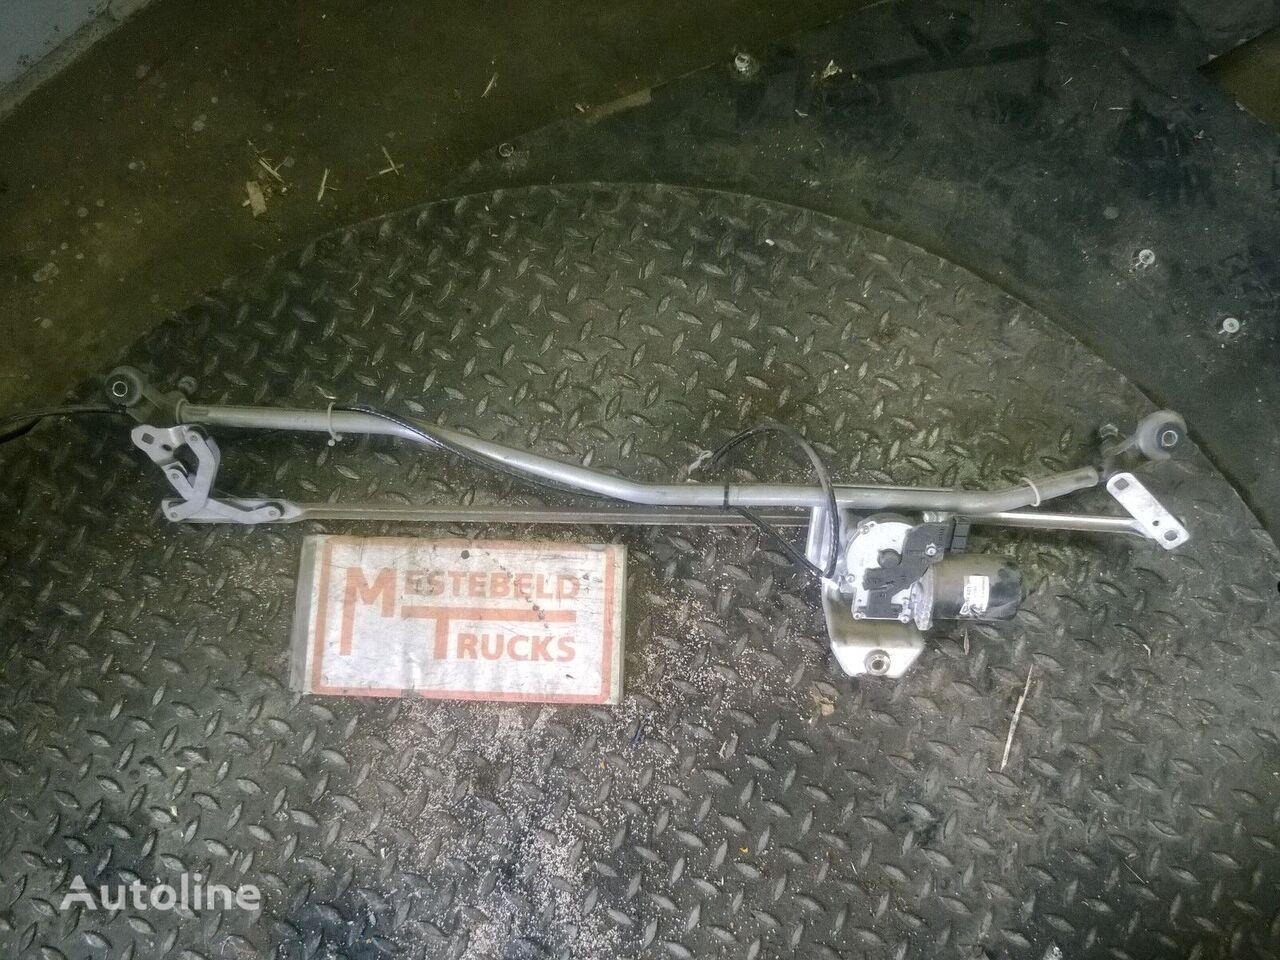 MERCEDES-BENZ Ruitenwissermechanisme + motor kamyon için Ruitenwissermechanisme + motor yedek parça